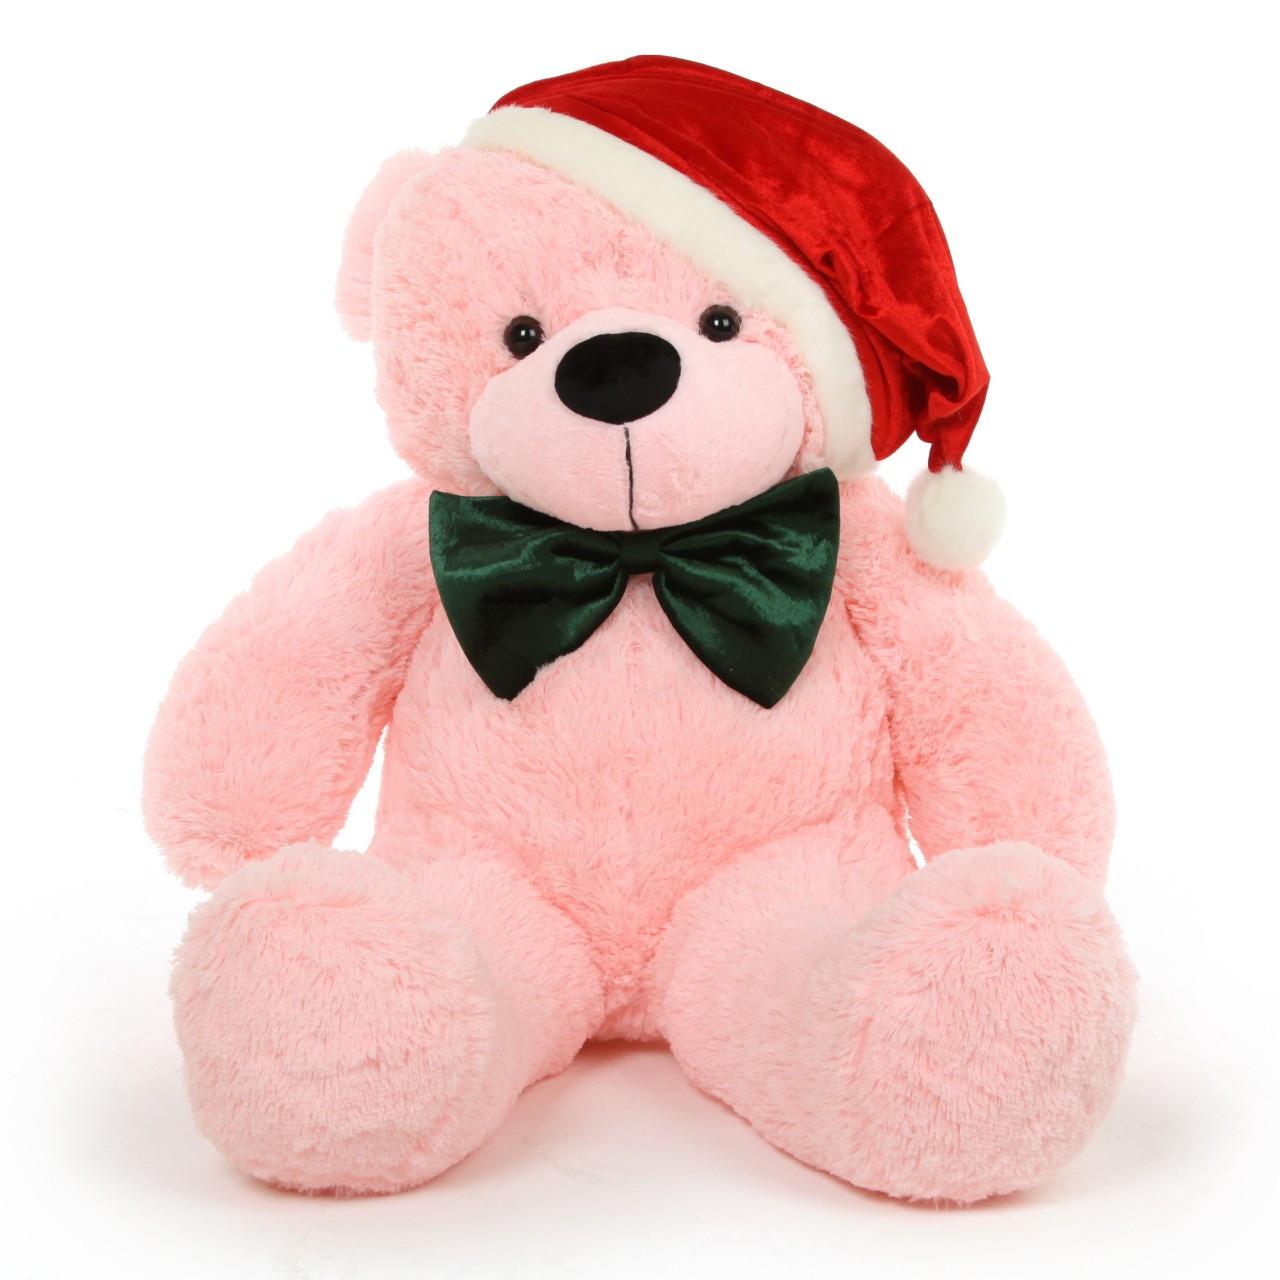 The most precious Christmas gift is a big bear hug from a Giant Teddy bear like Lady Christmas Cuddles!